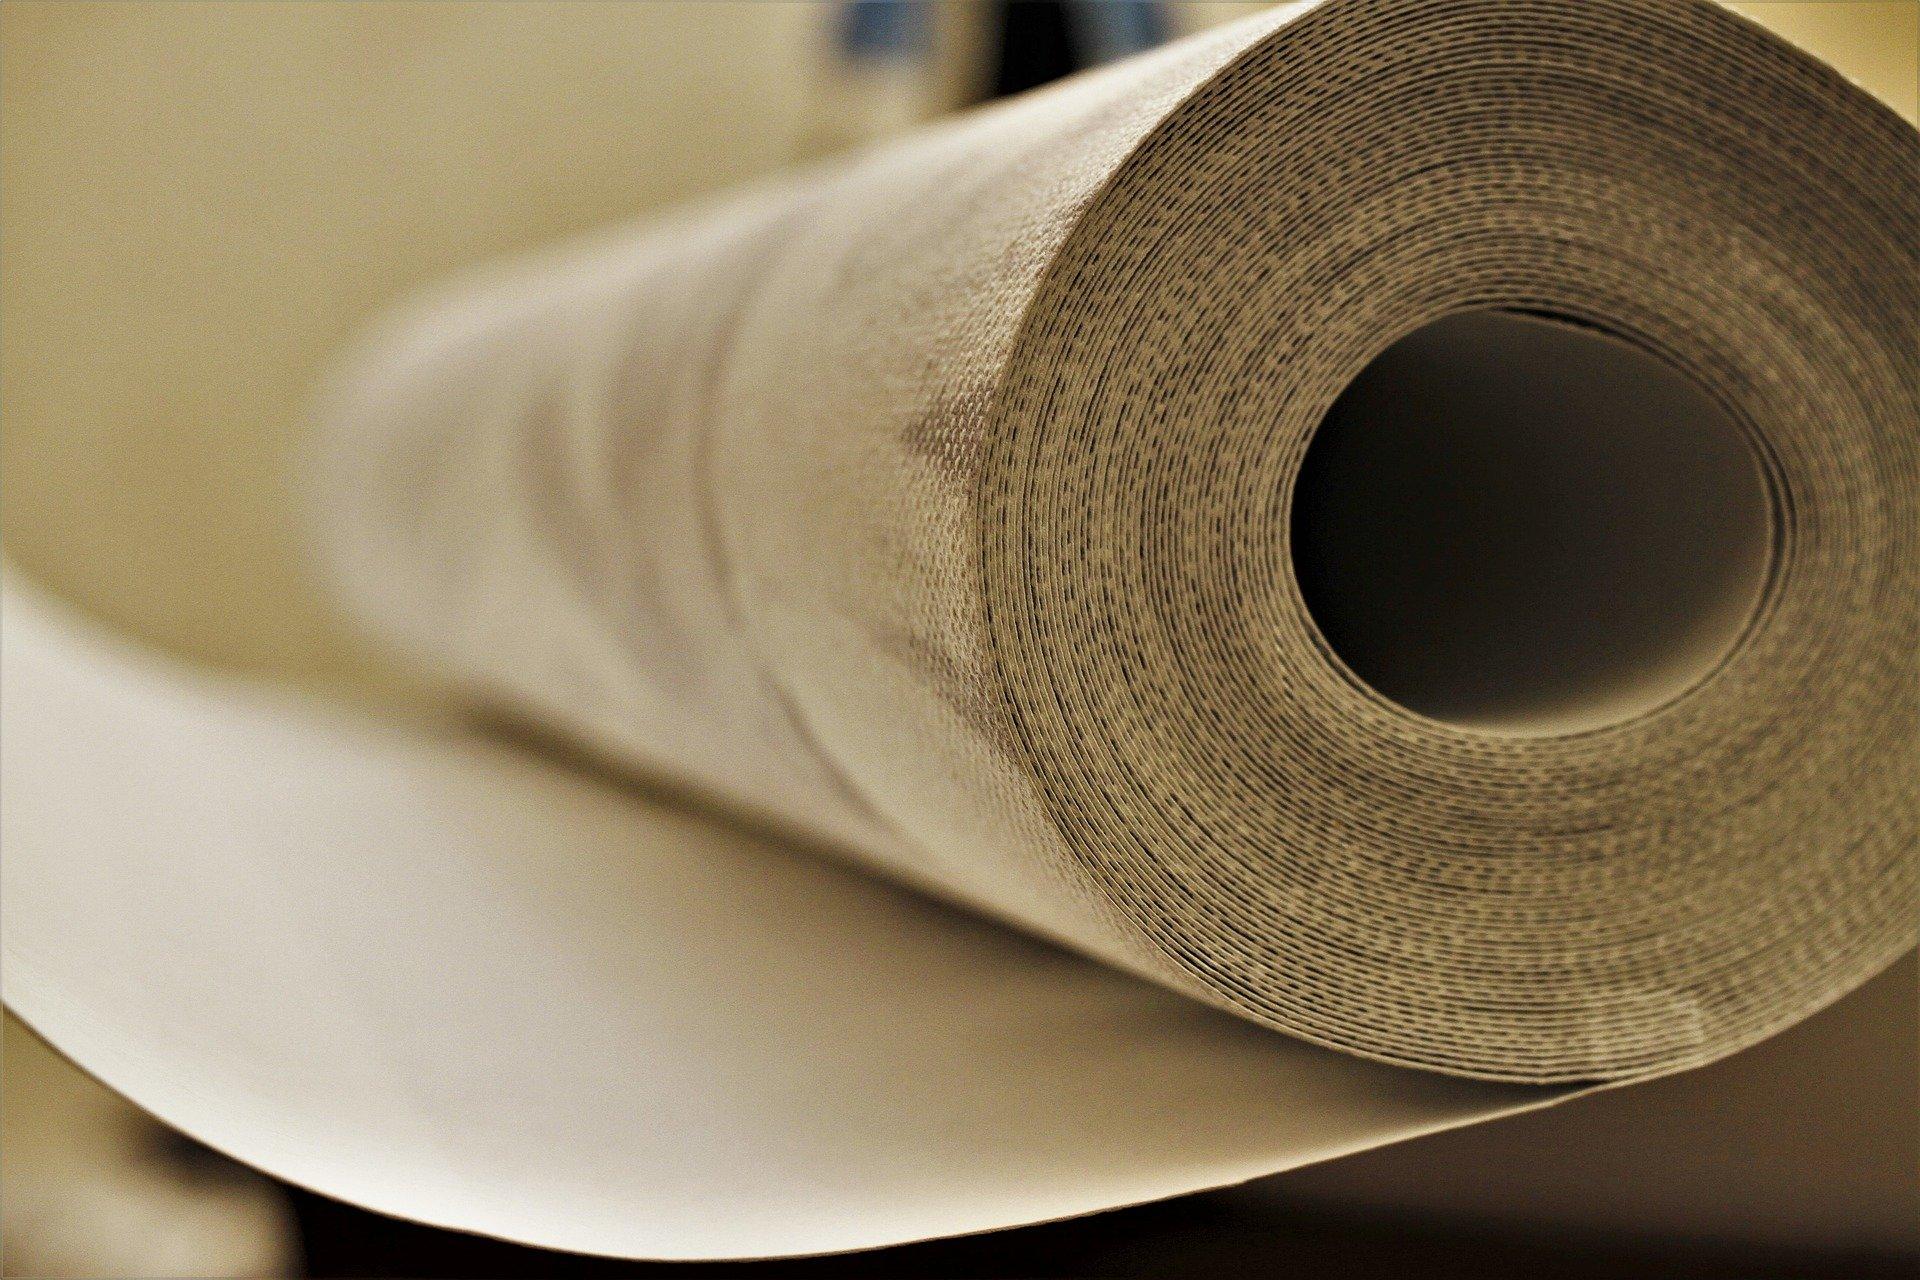 A roll of wallpaper